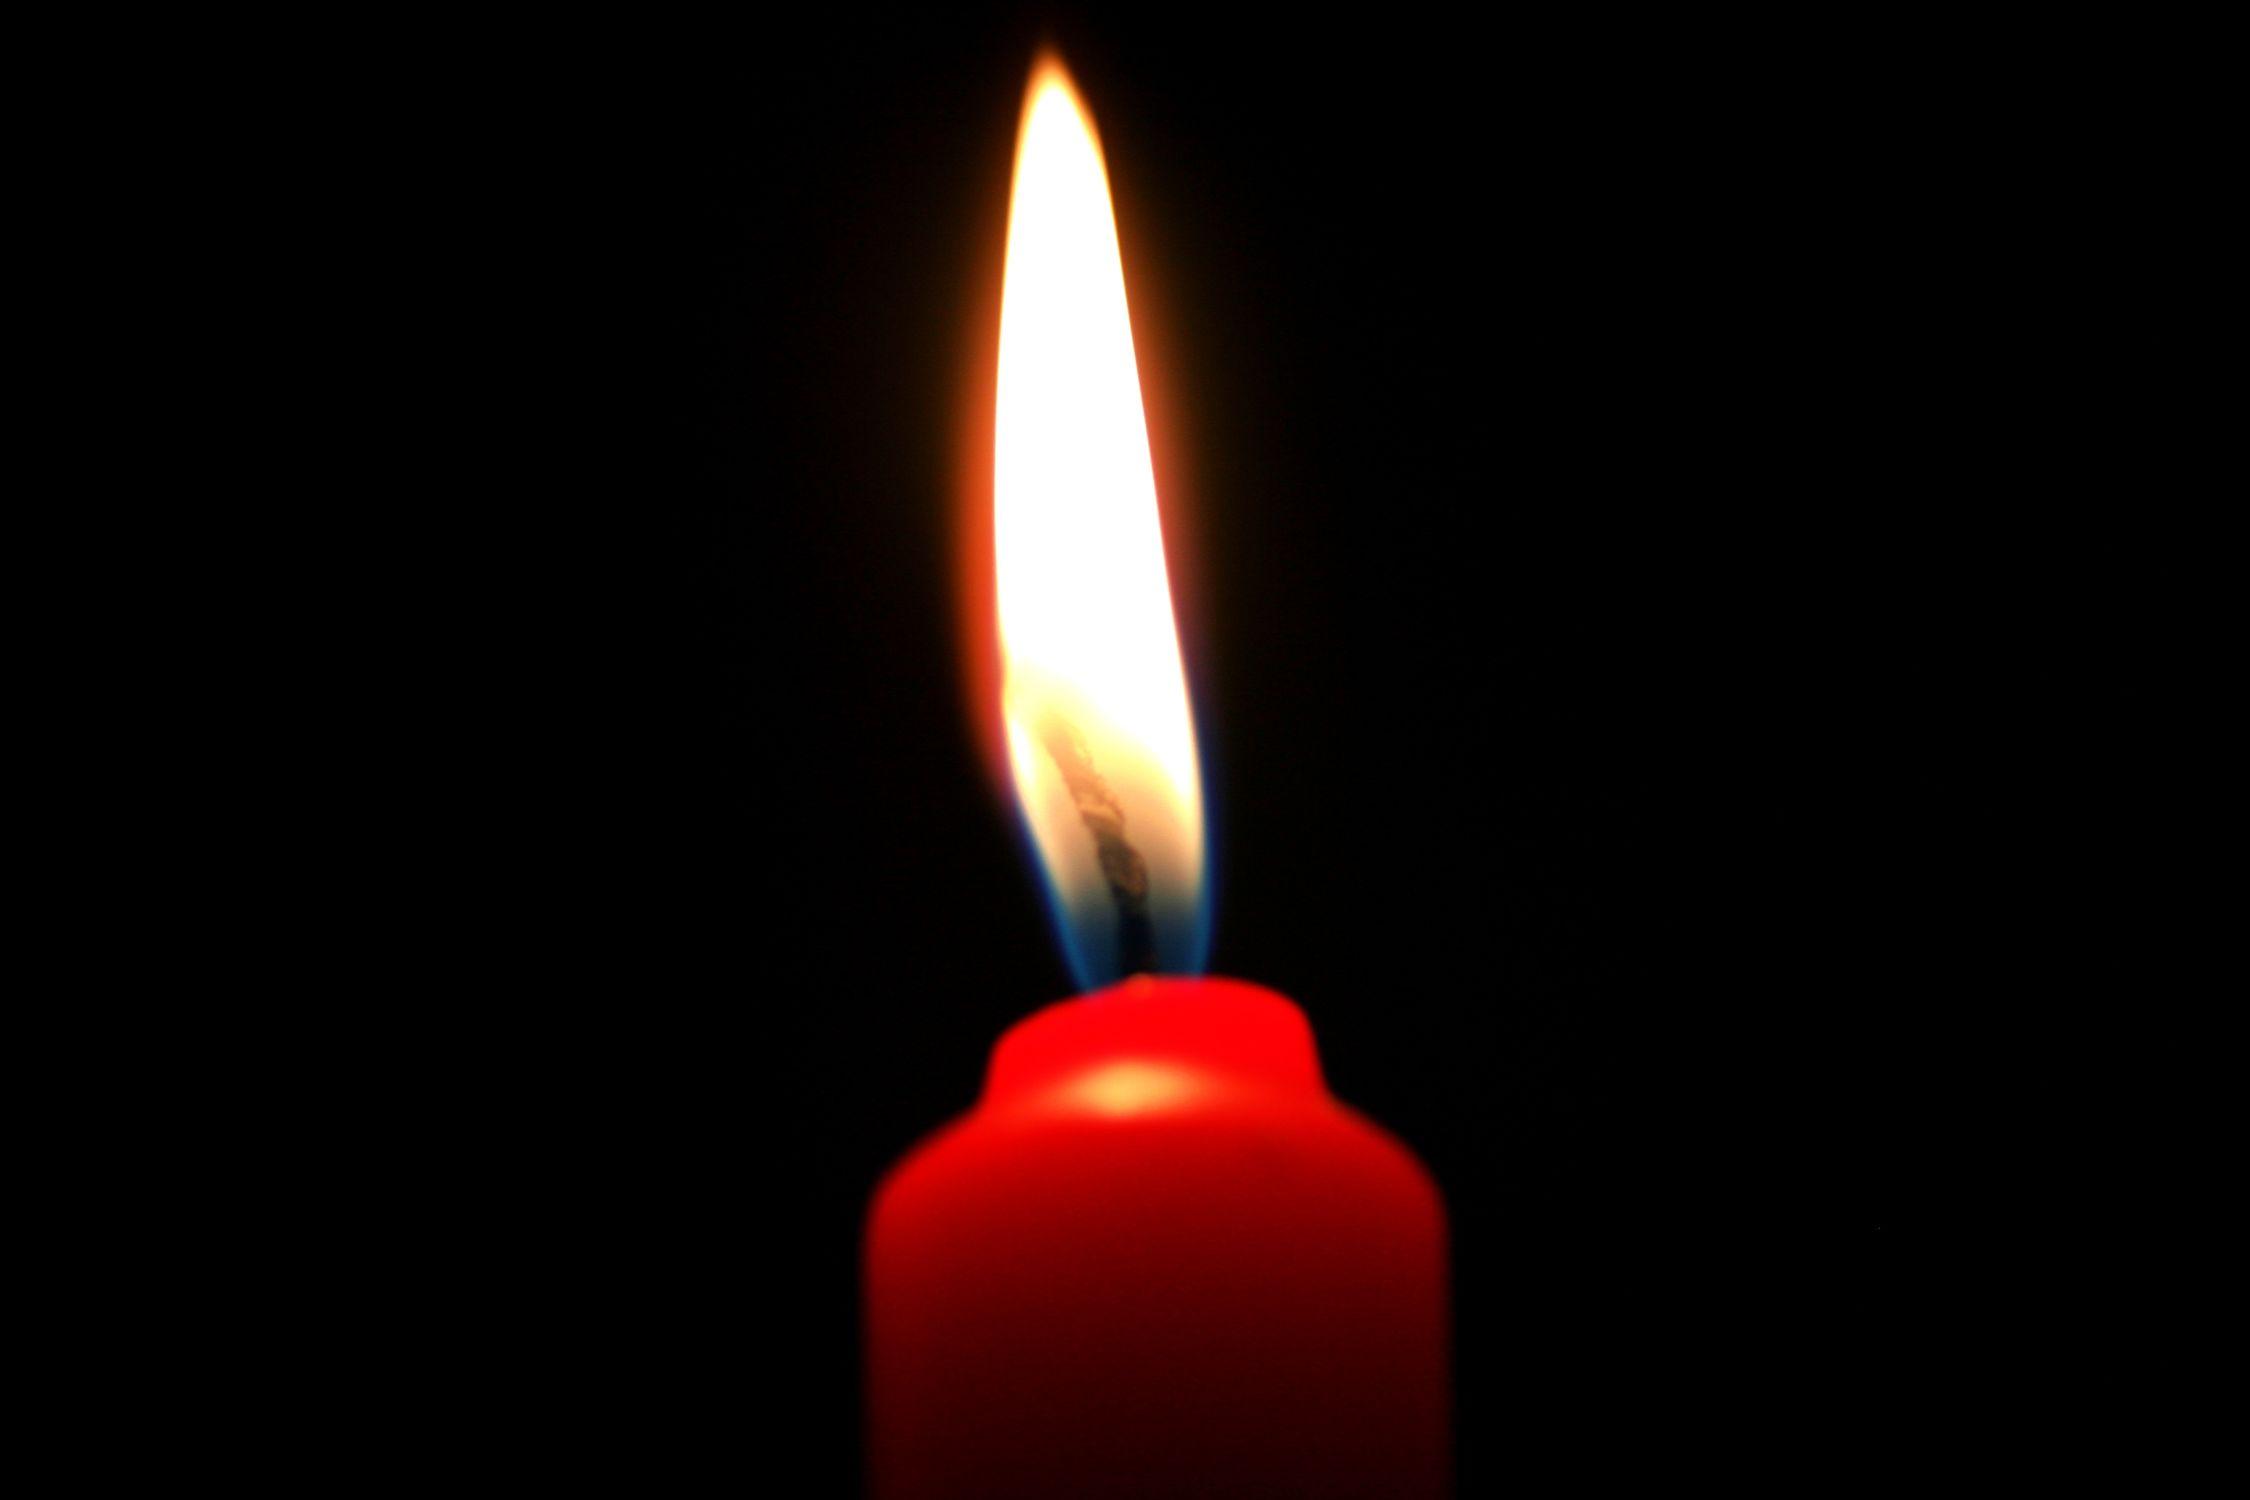 Bild mit Natur, Elemente, Himmel, Feuer, Flammen, Dunkelheit, Kerze, Kerzen, Kerzenlicht, romantik, Kerzenschein, Licht Bilder, Meditation, candel, candel light, light, Licht